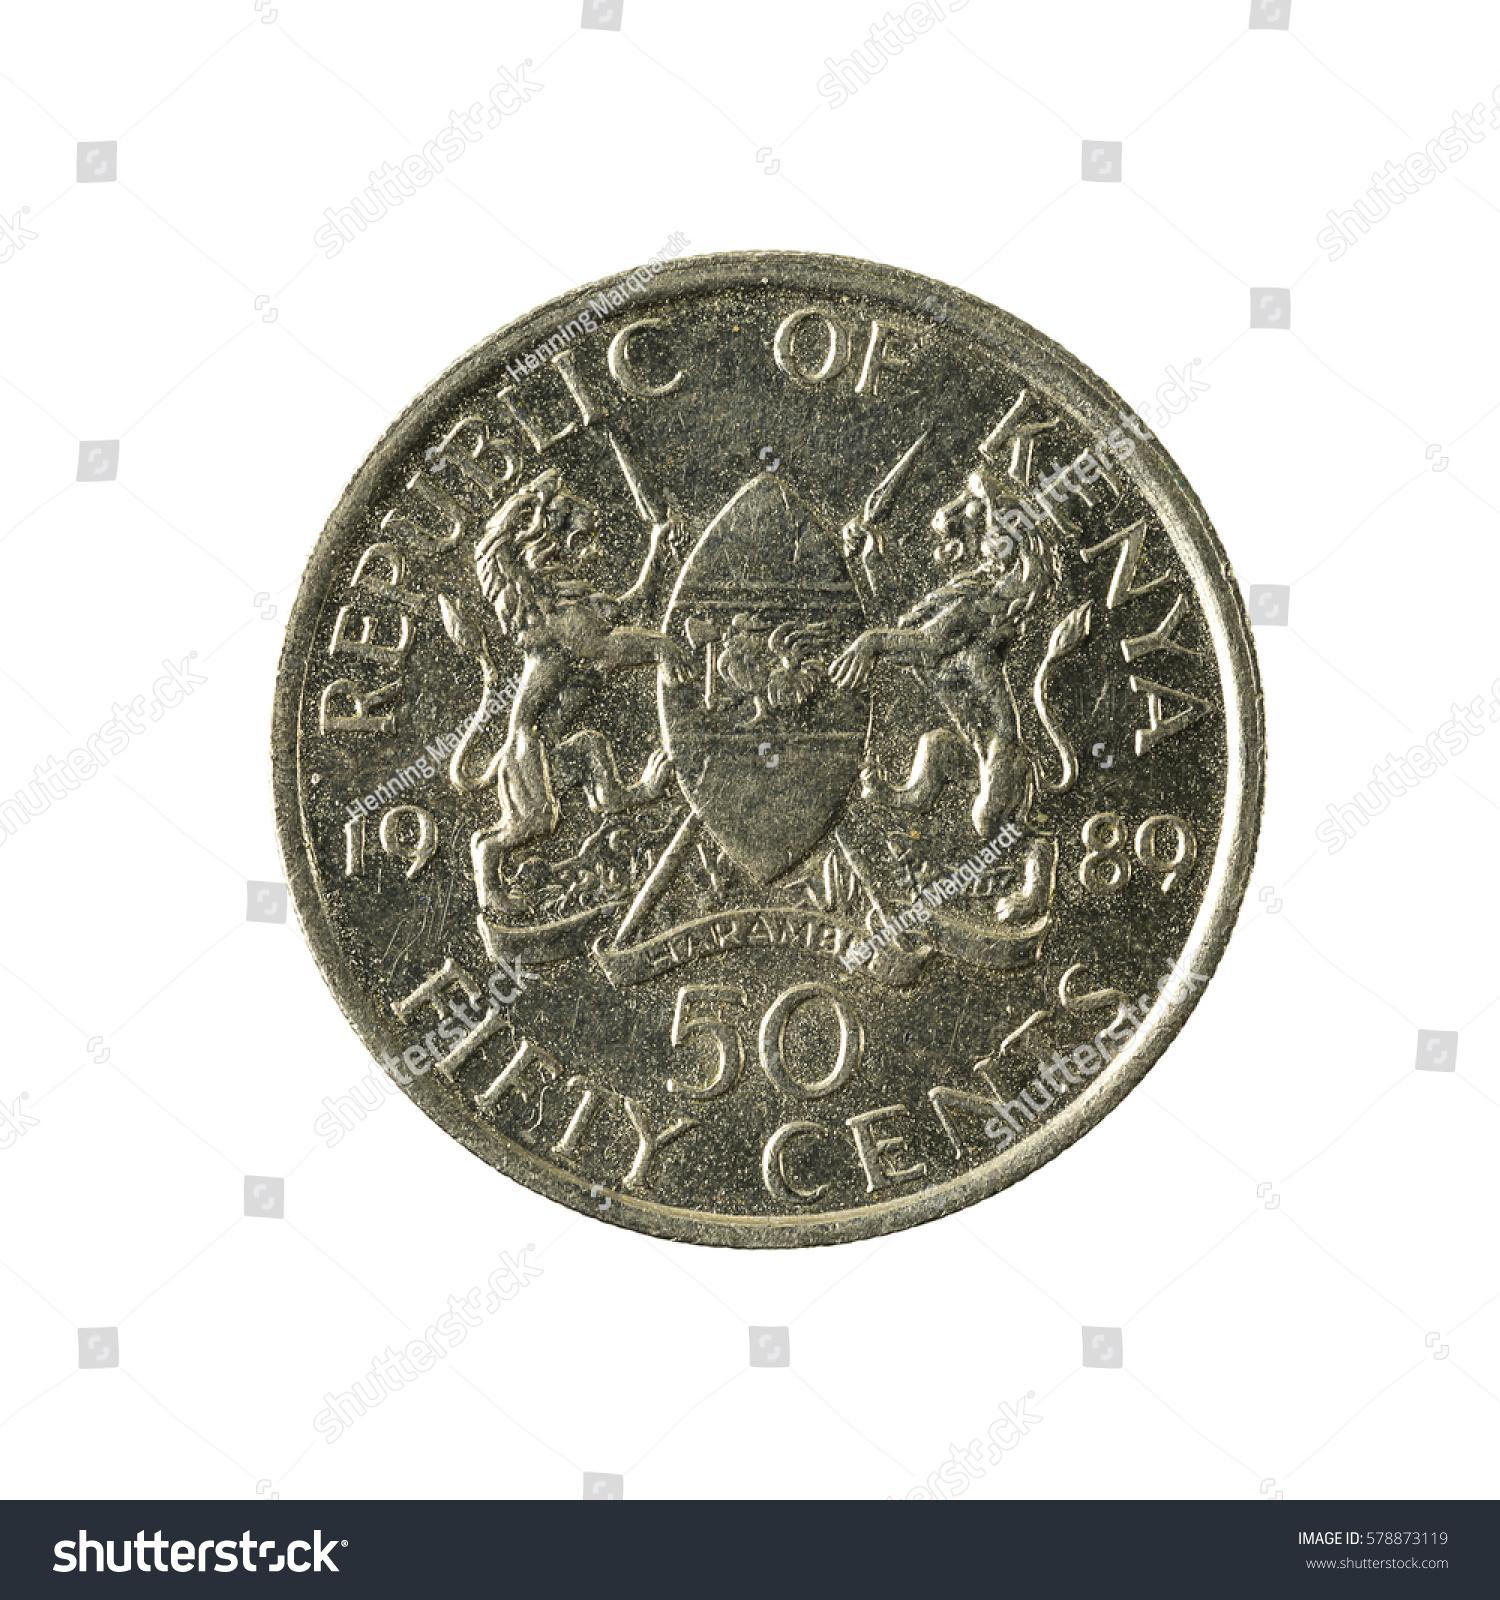 Target coin prediction kenya : Zrx coin jar fillers